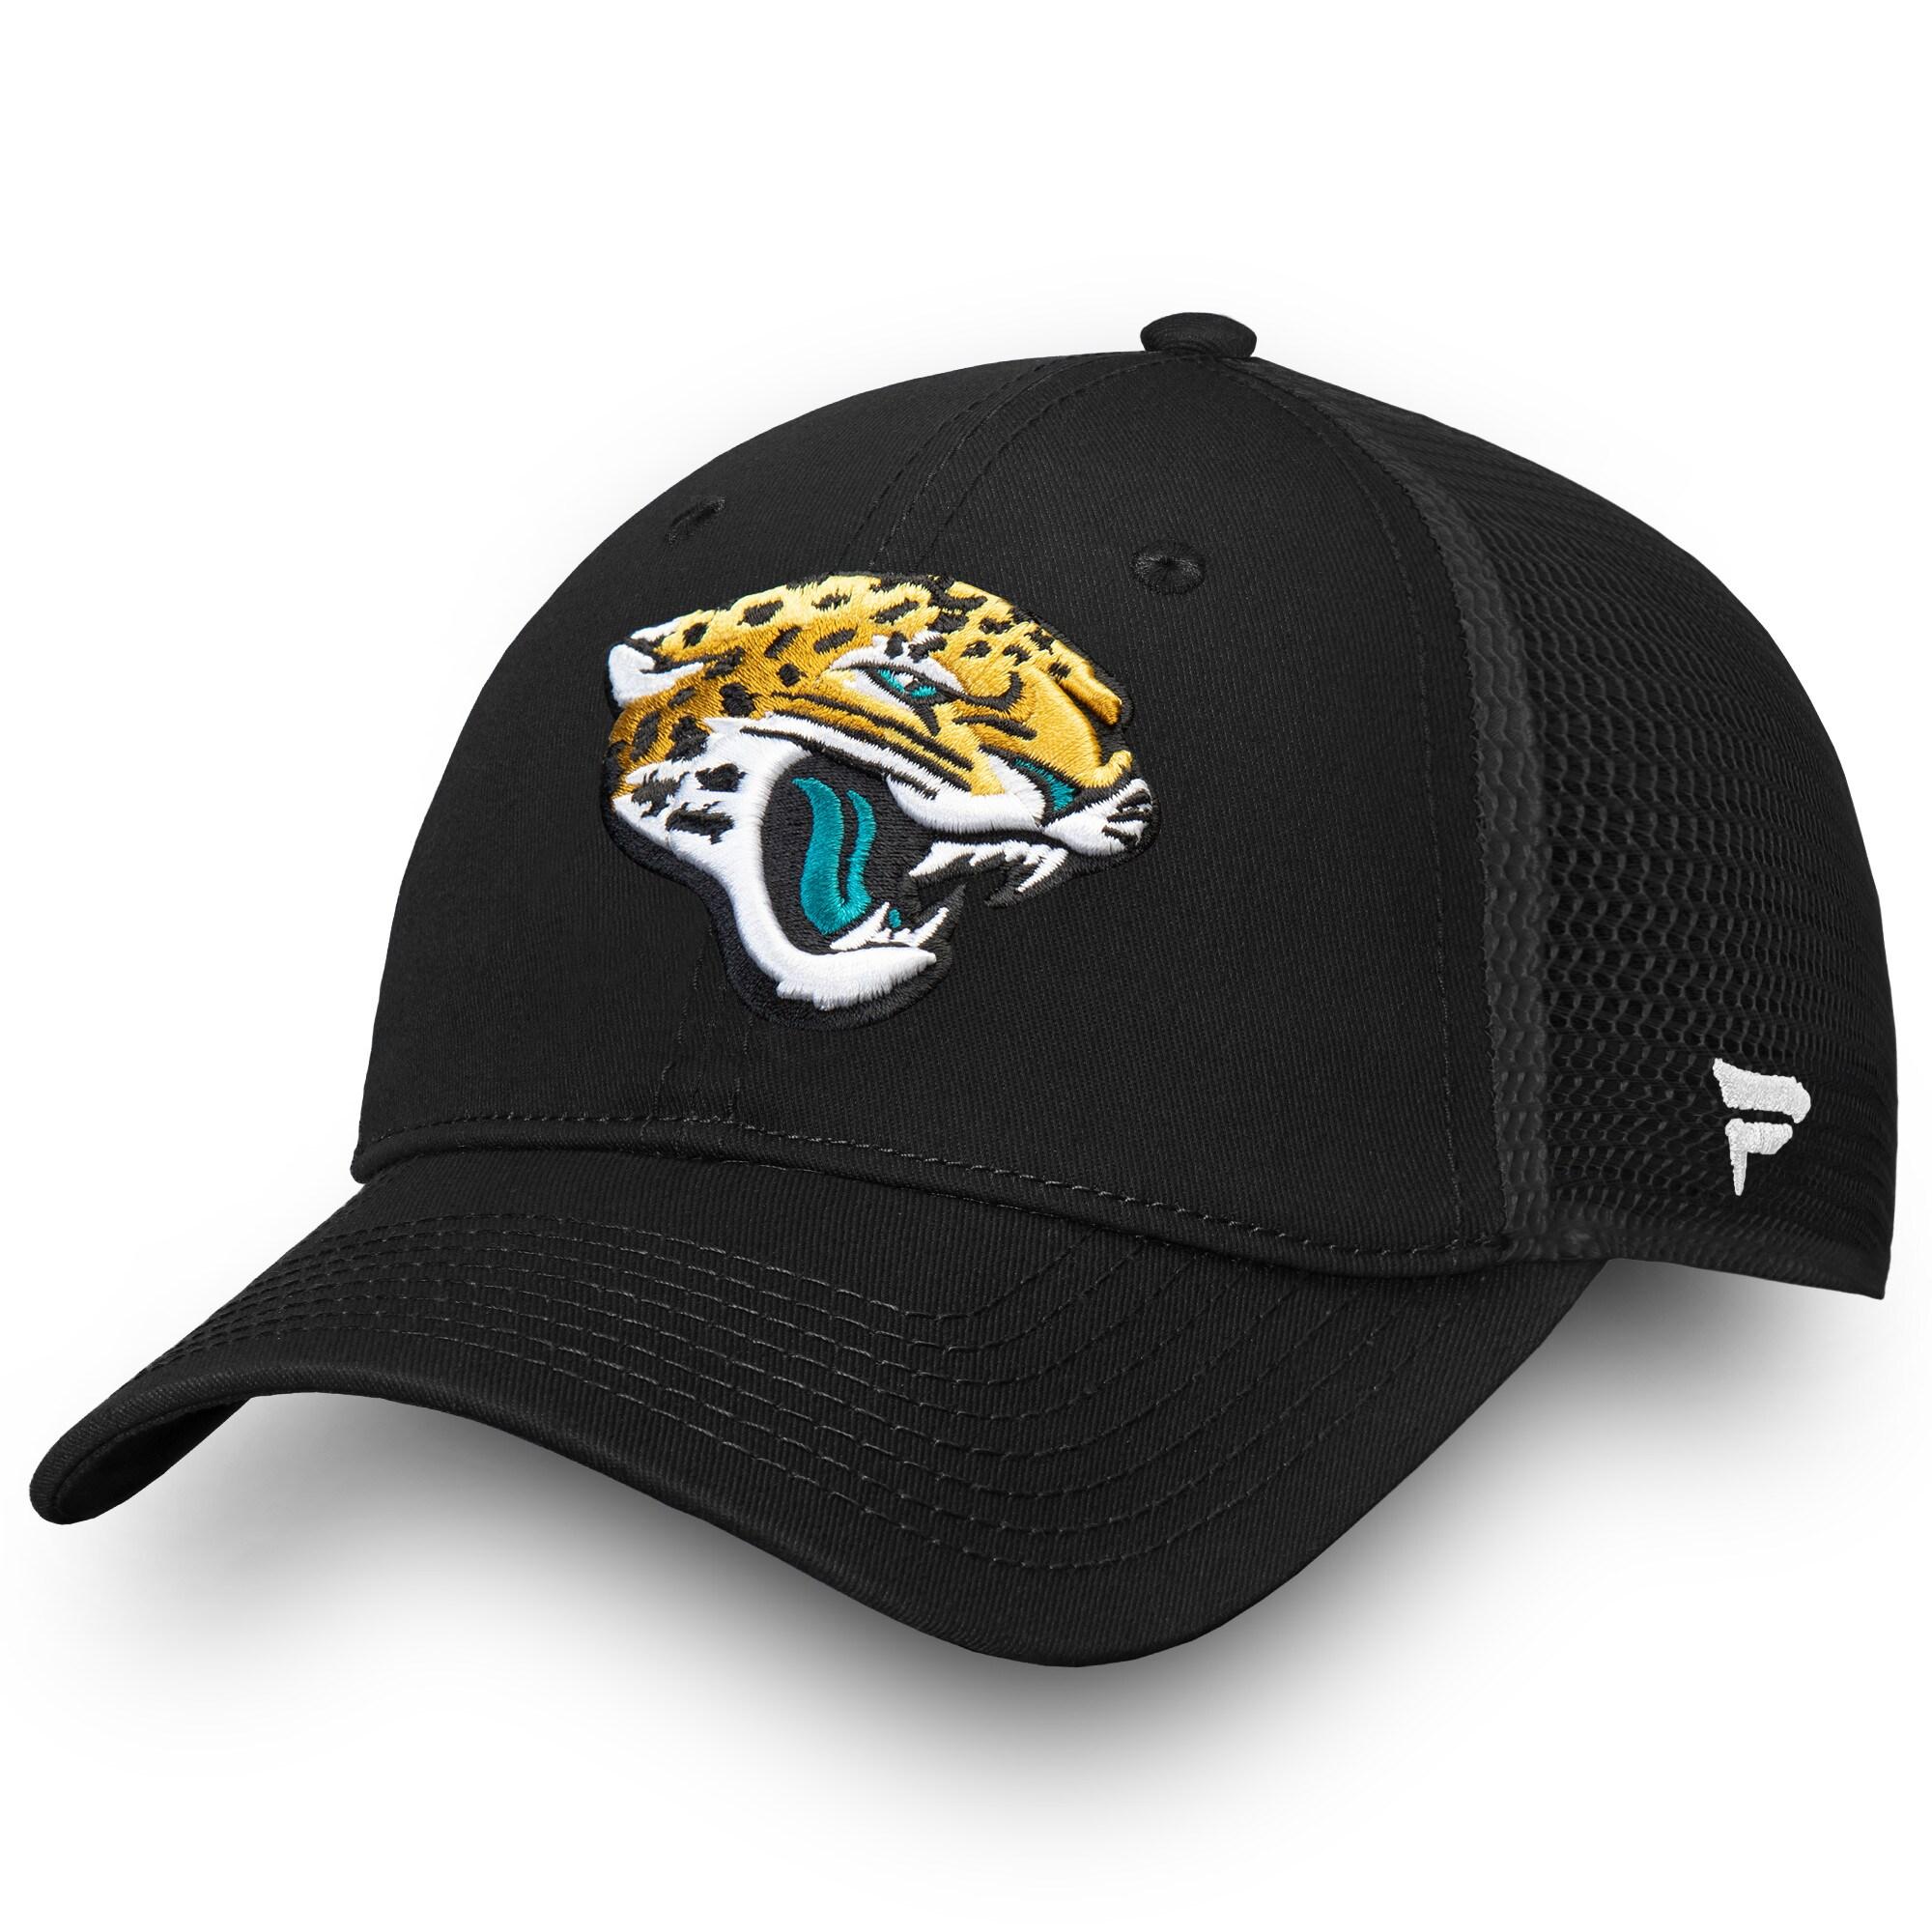 Jacksonville Jaguars NFL Pro Line by Fanatics Branded Elevated Core Trucker Adjustable Snapback Hat - Black